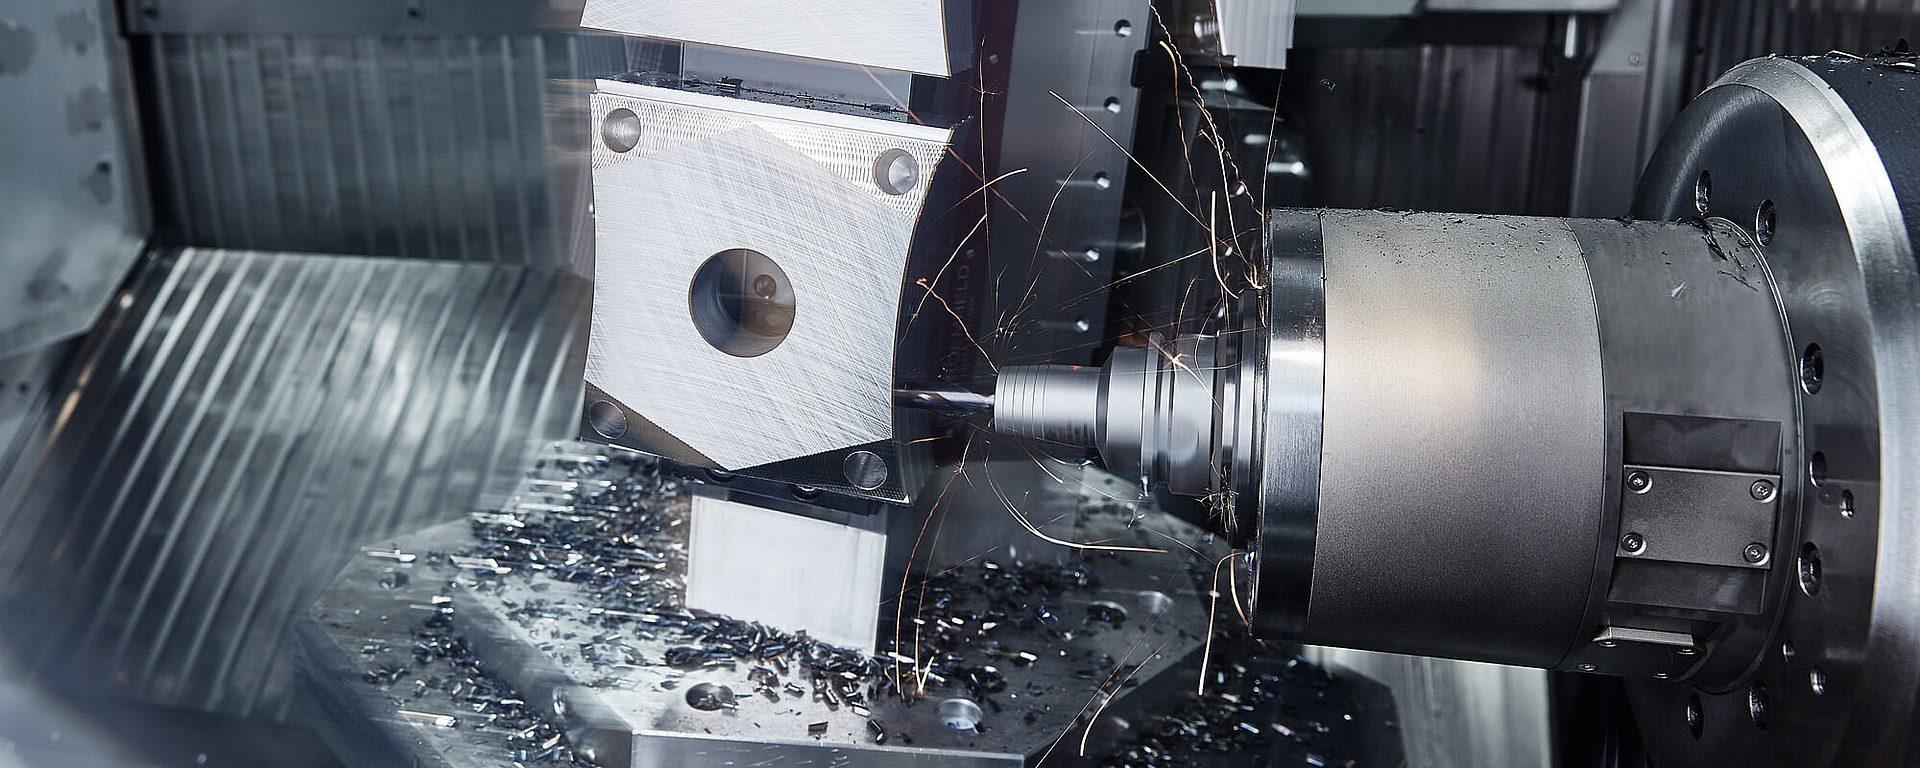 metal cutting machine lathe